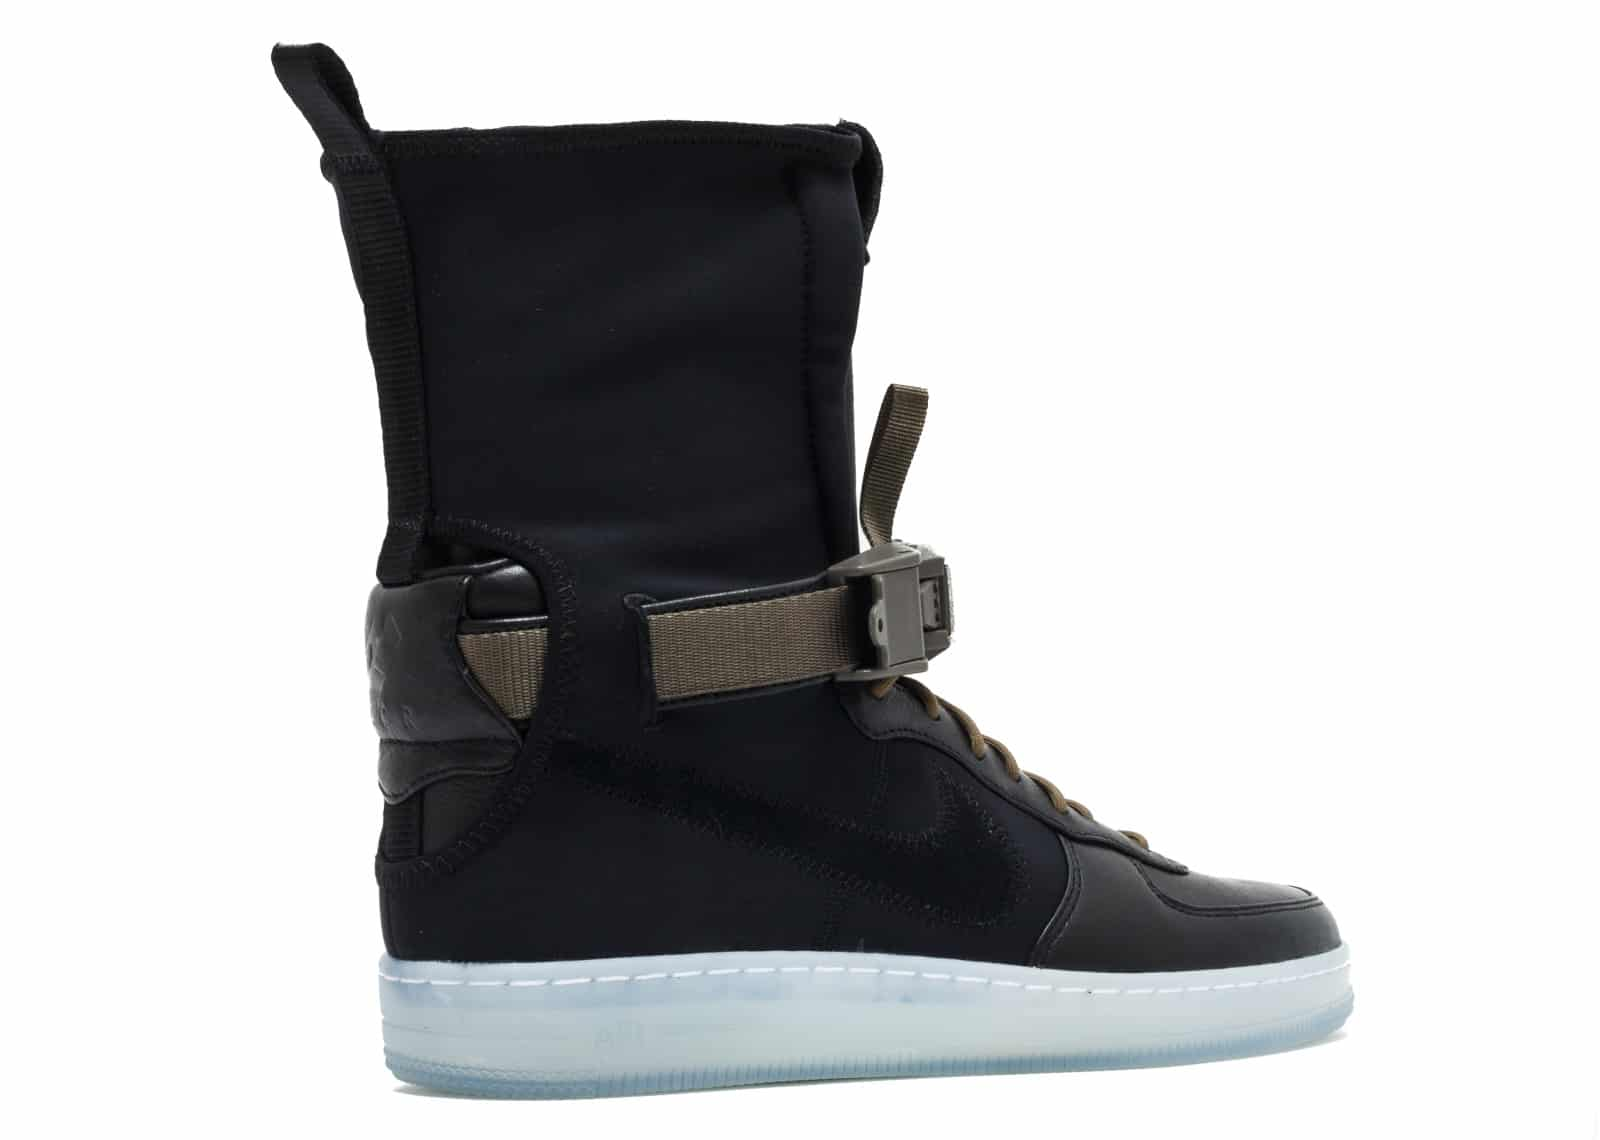 Nike Air Force 1 Downtown Acronym Black White